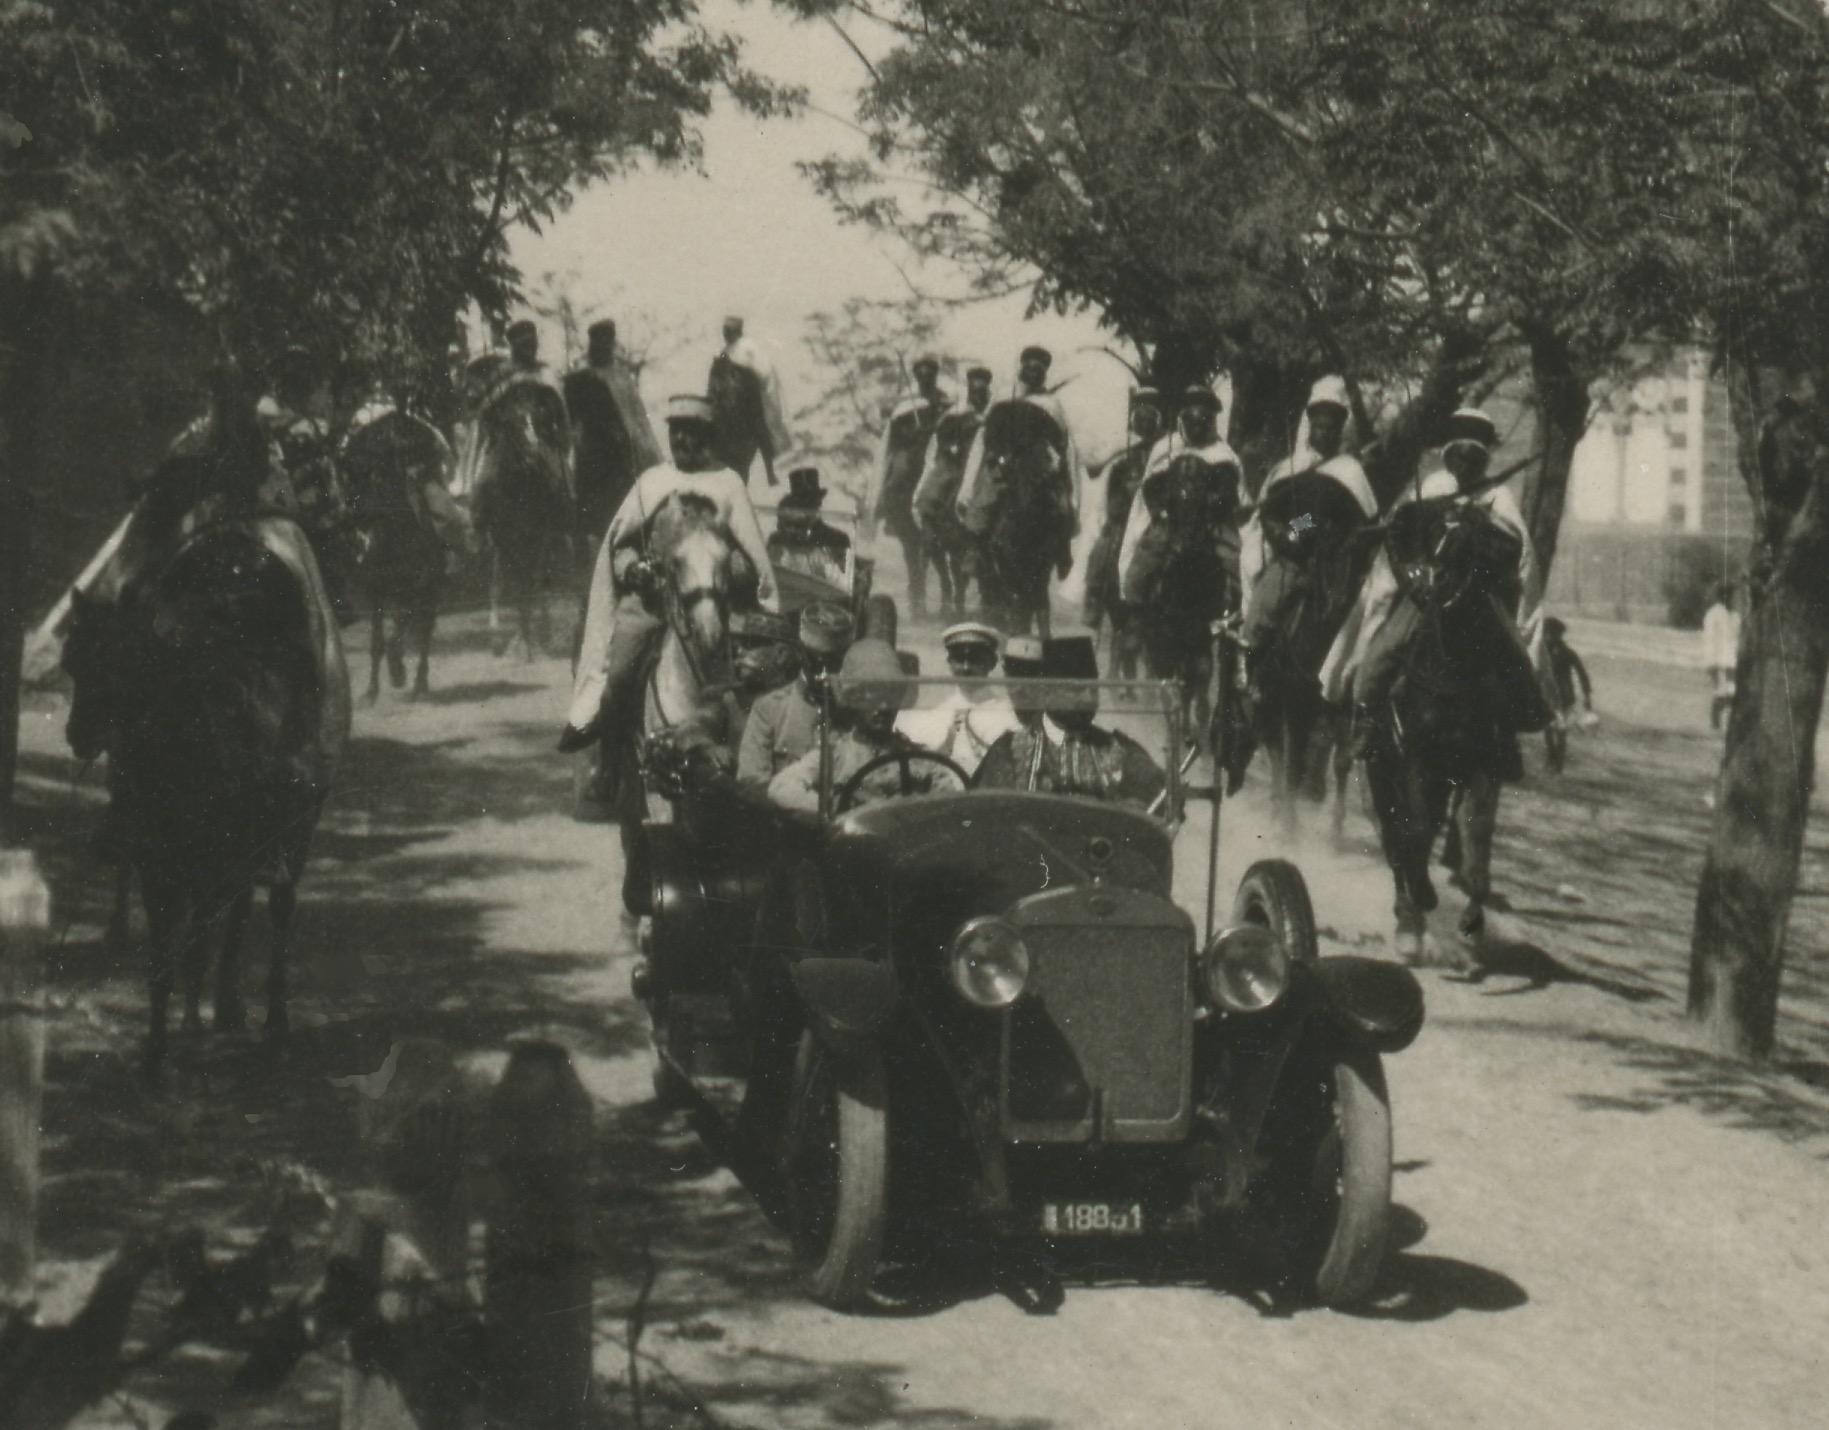 Snapshot - Photo papier originale - Revue - 1940 - Territorial - Uniforme - France - Snapshot - Famille - Syrie - Spahis